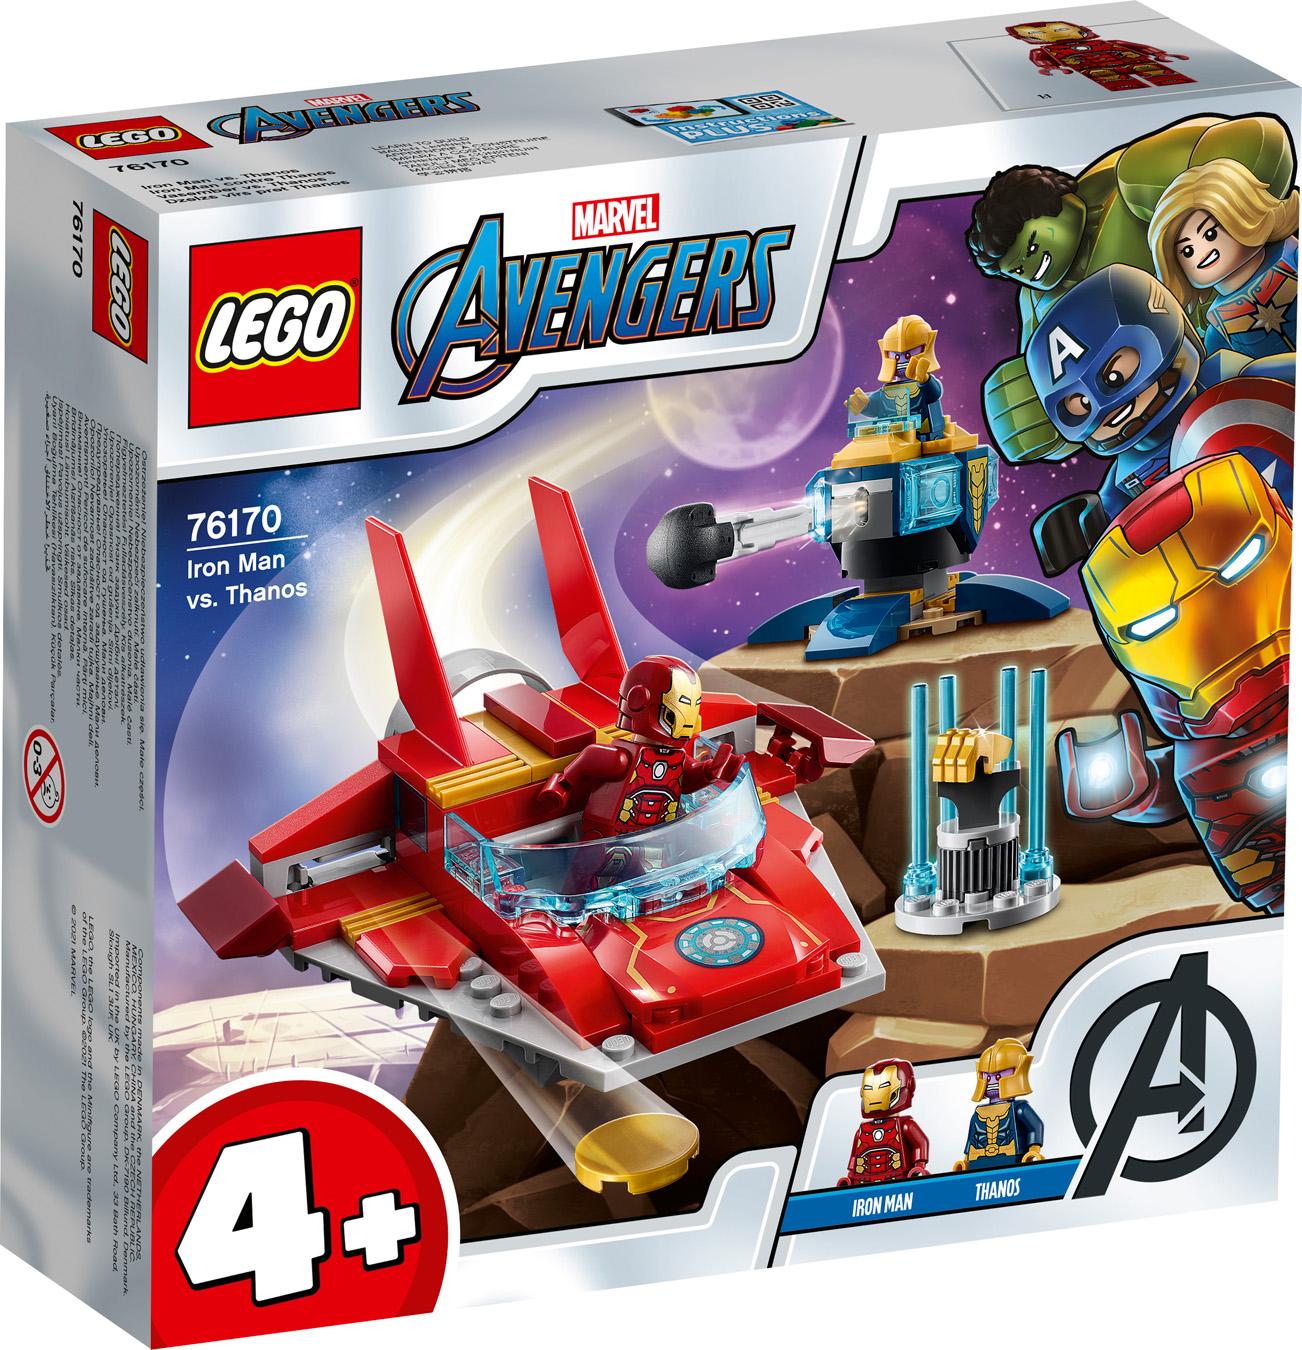 Iron Man contre Thanos - LEGO Avengers - 76170